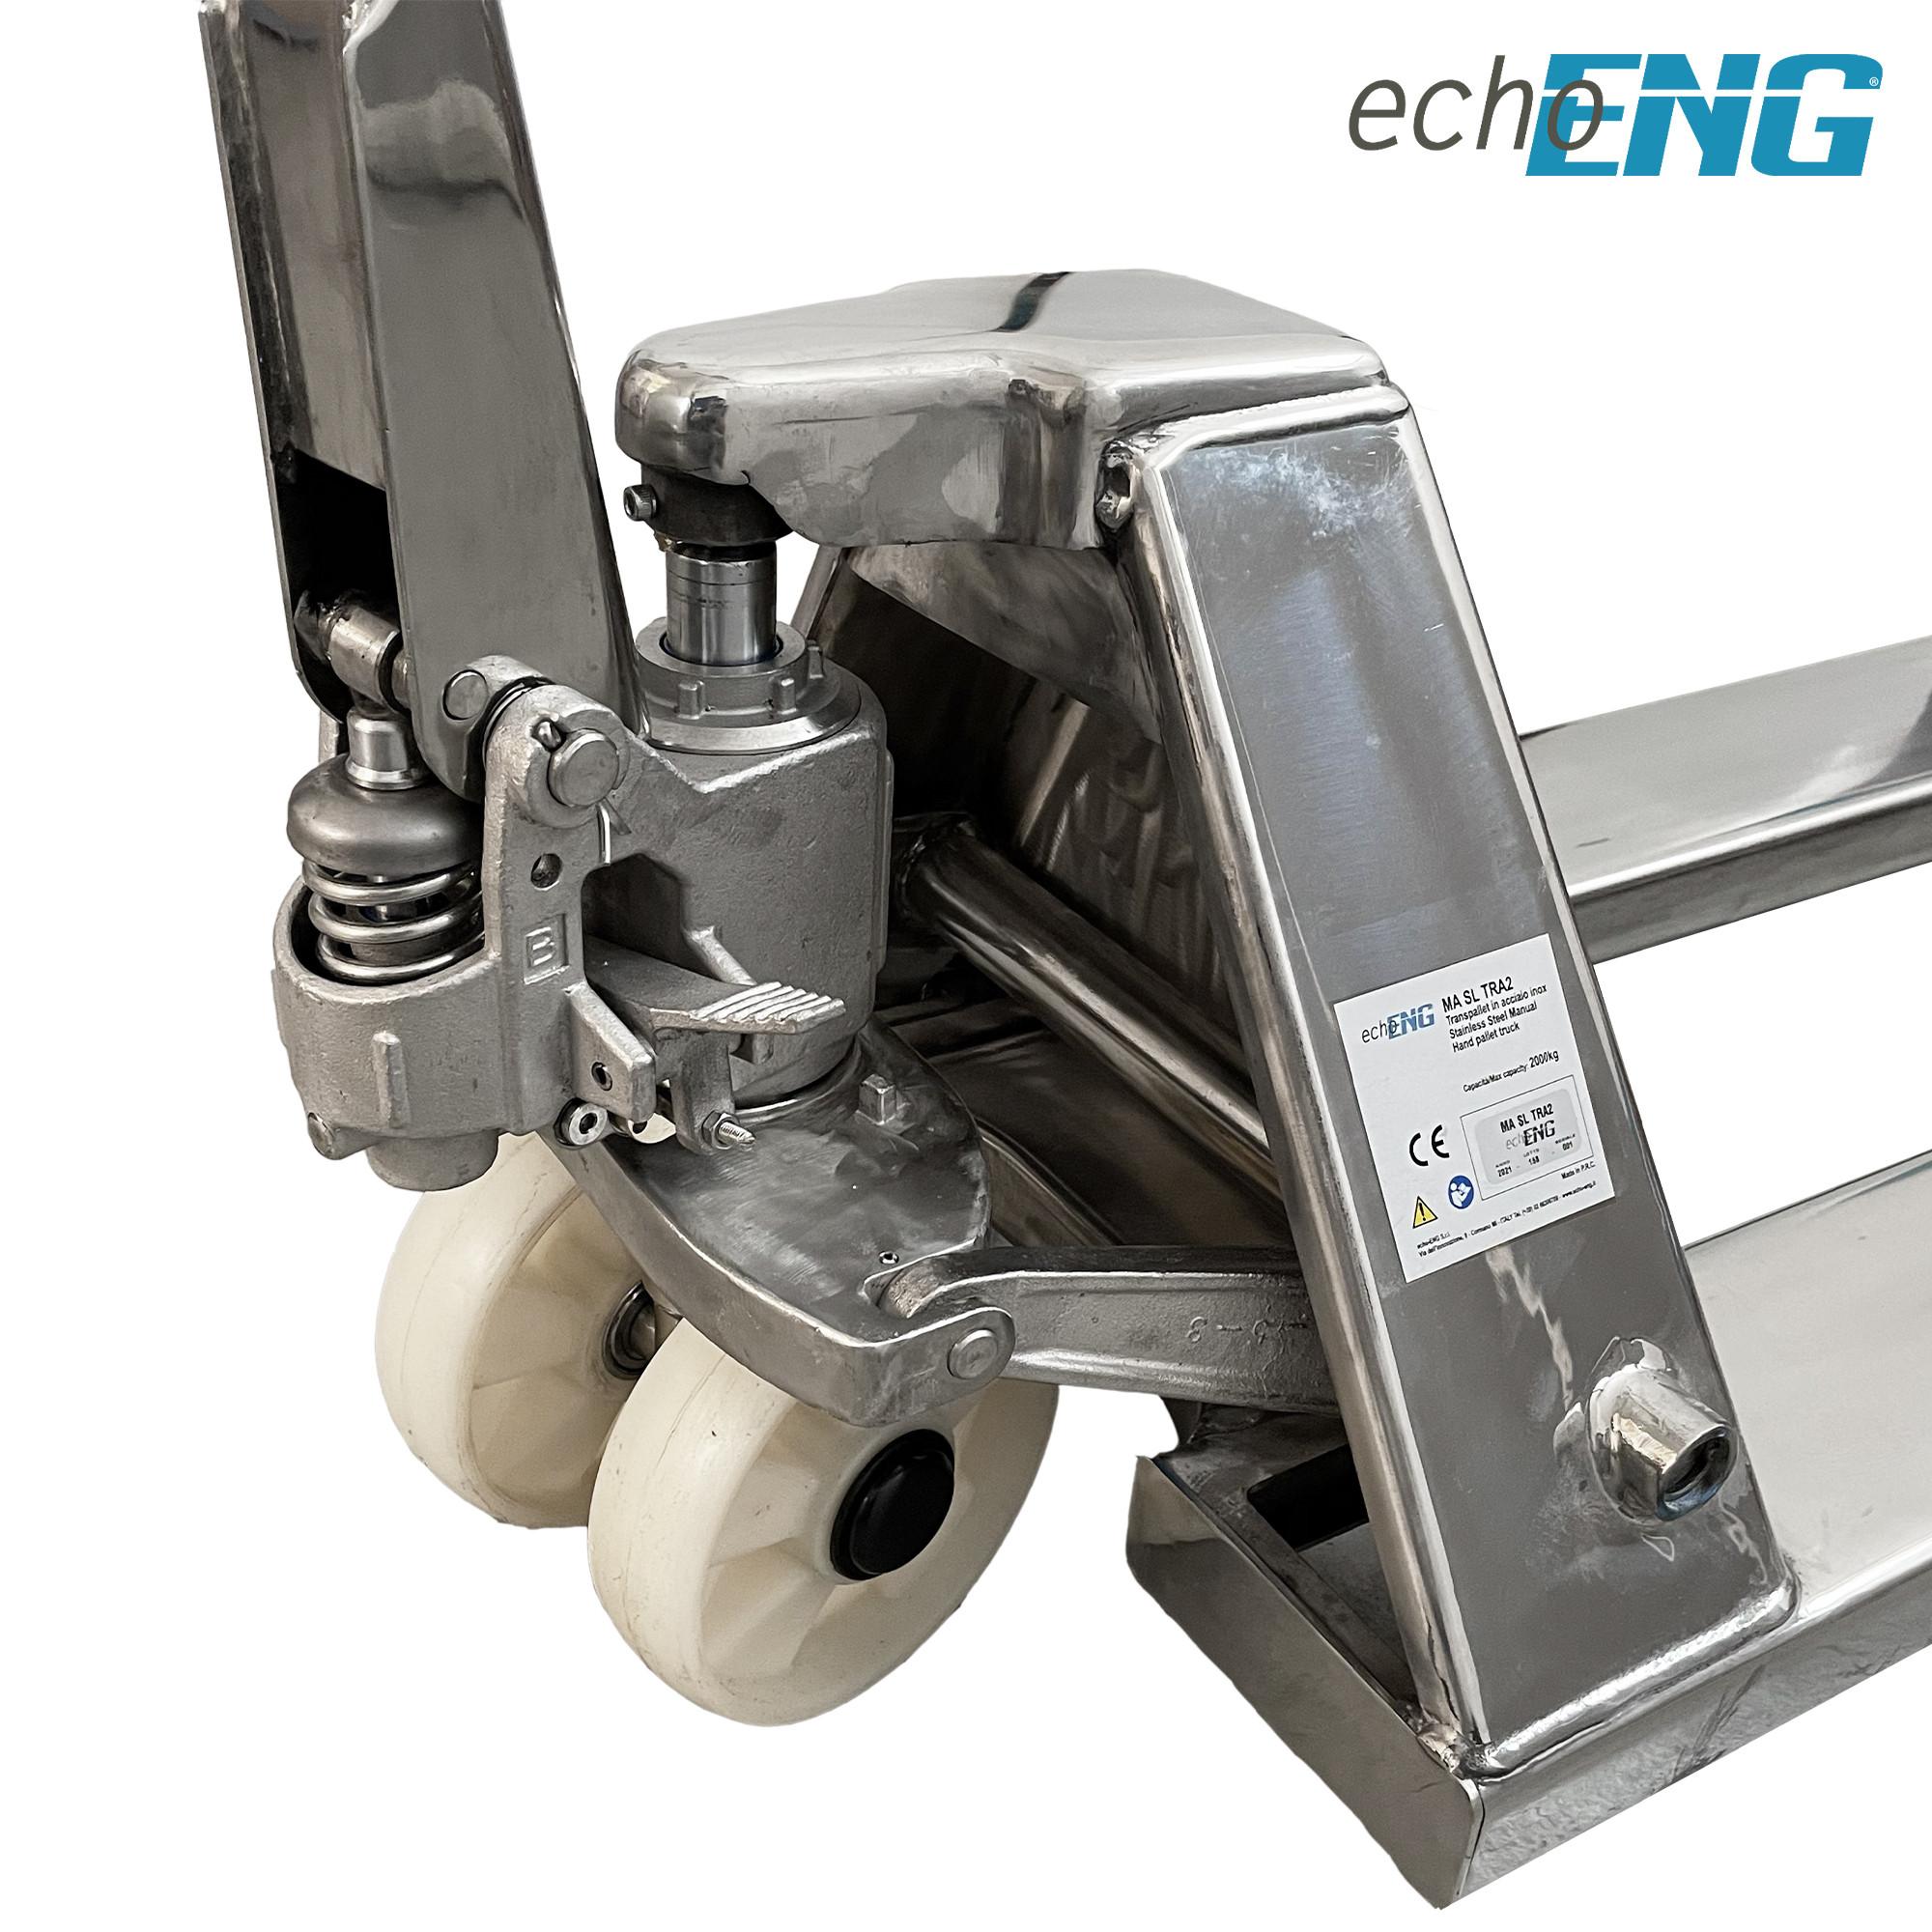 Transpallet sollevatore professionale 2000 Kg acciaio inox AISI 304 - MA SL TRA2